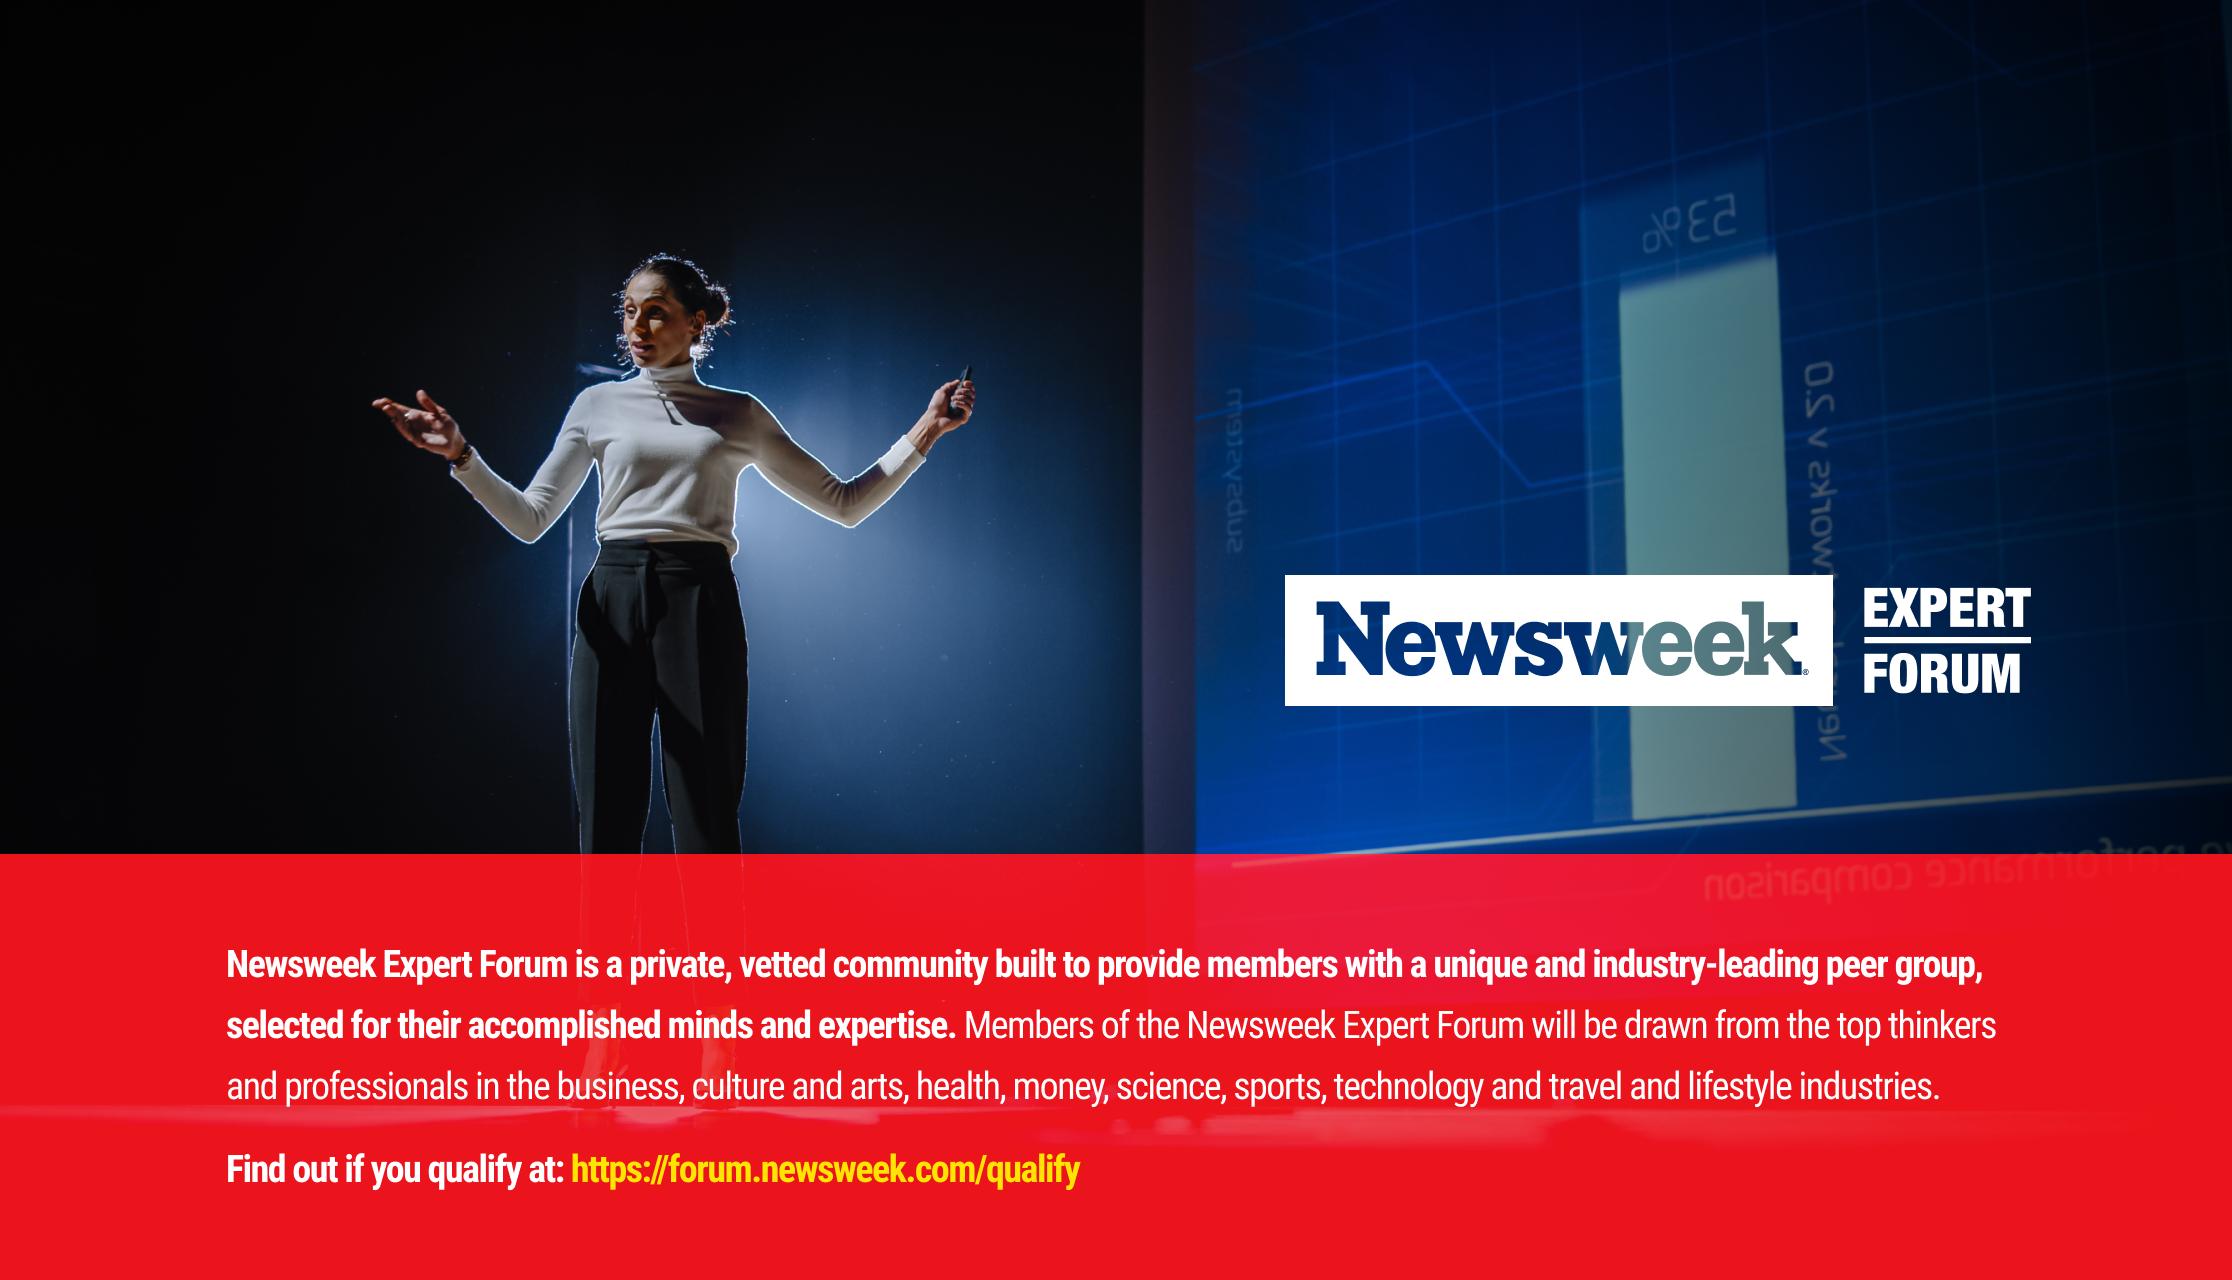 Newsweek Expert Forum